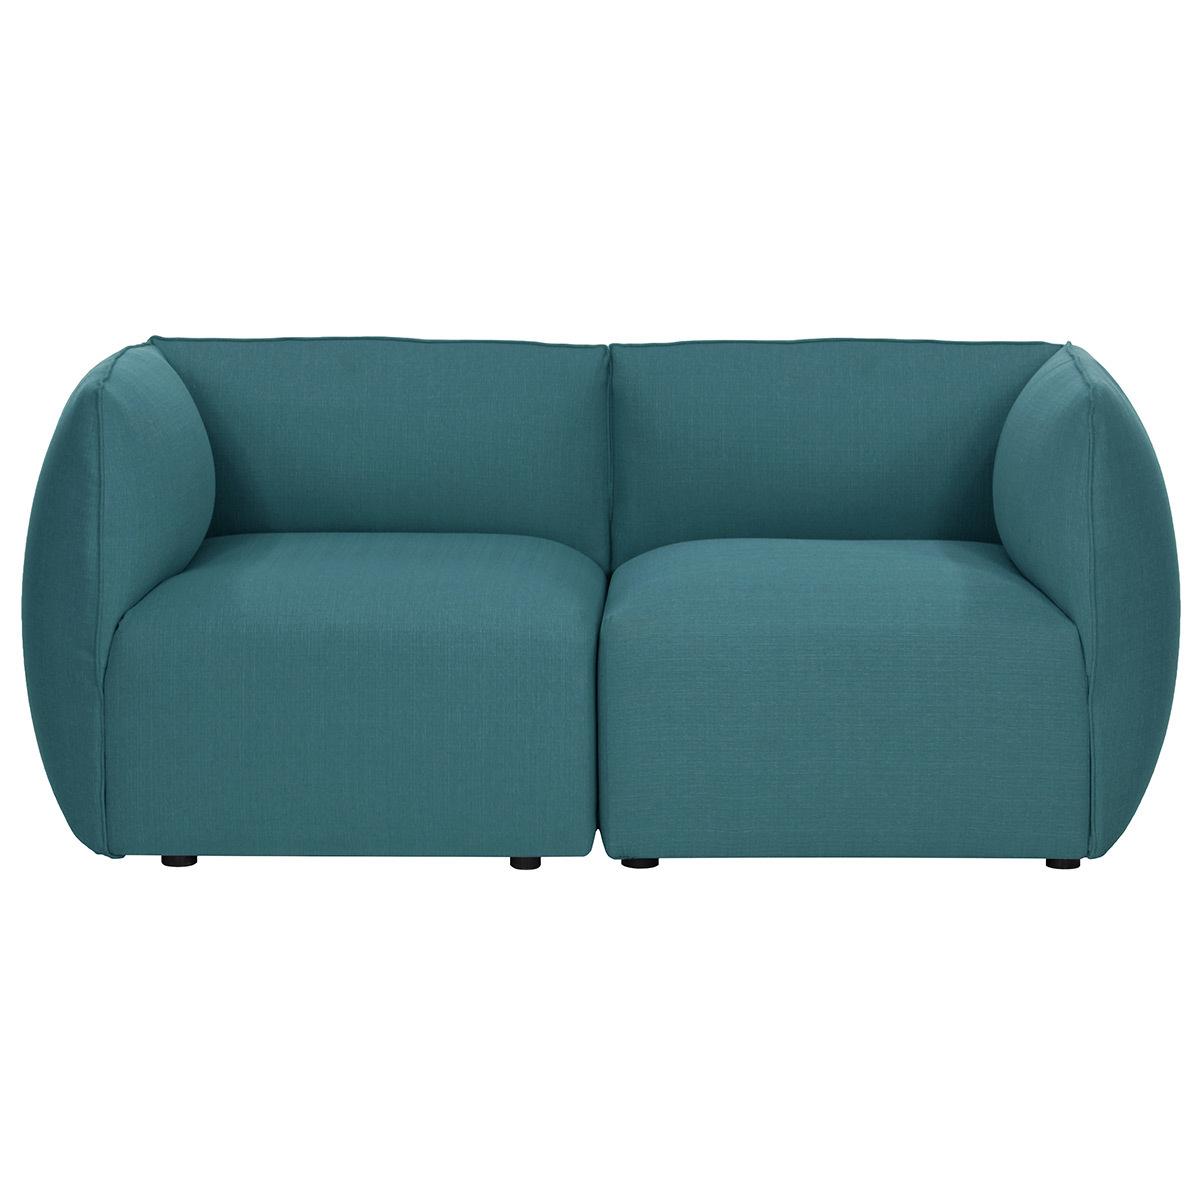 Divano design modulabile Blu anatra 2 posti MODULO